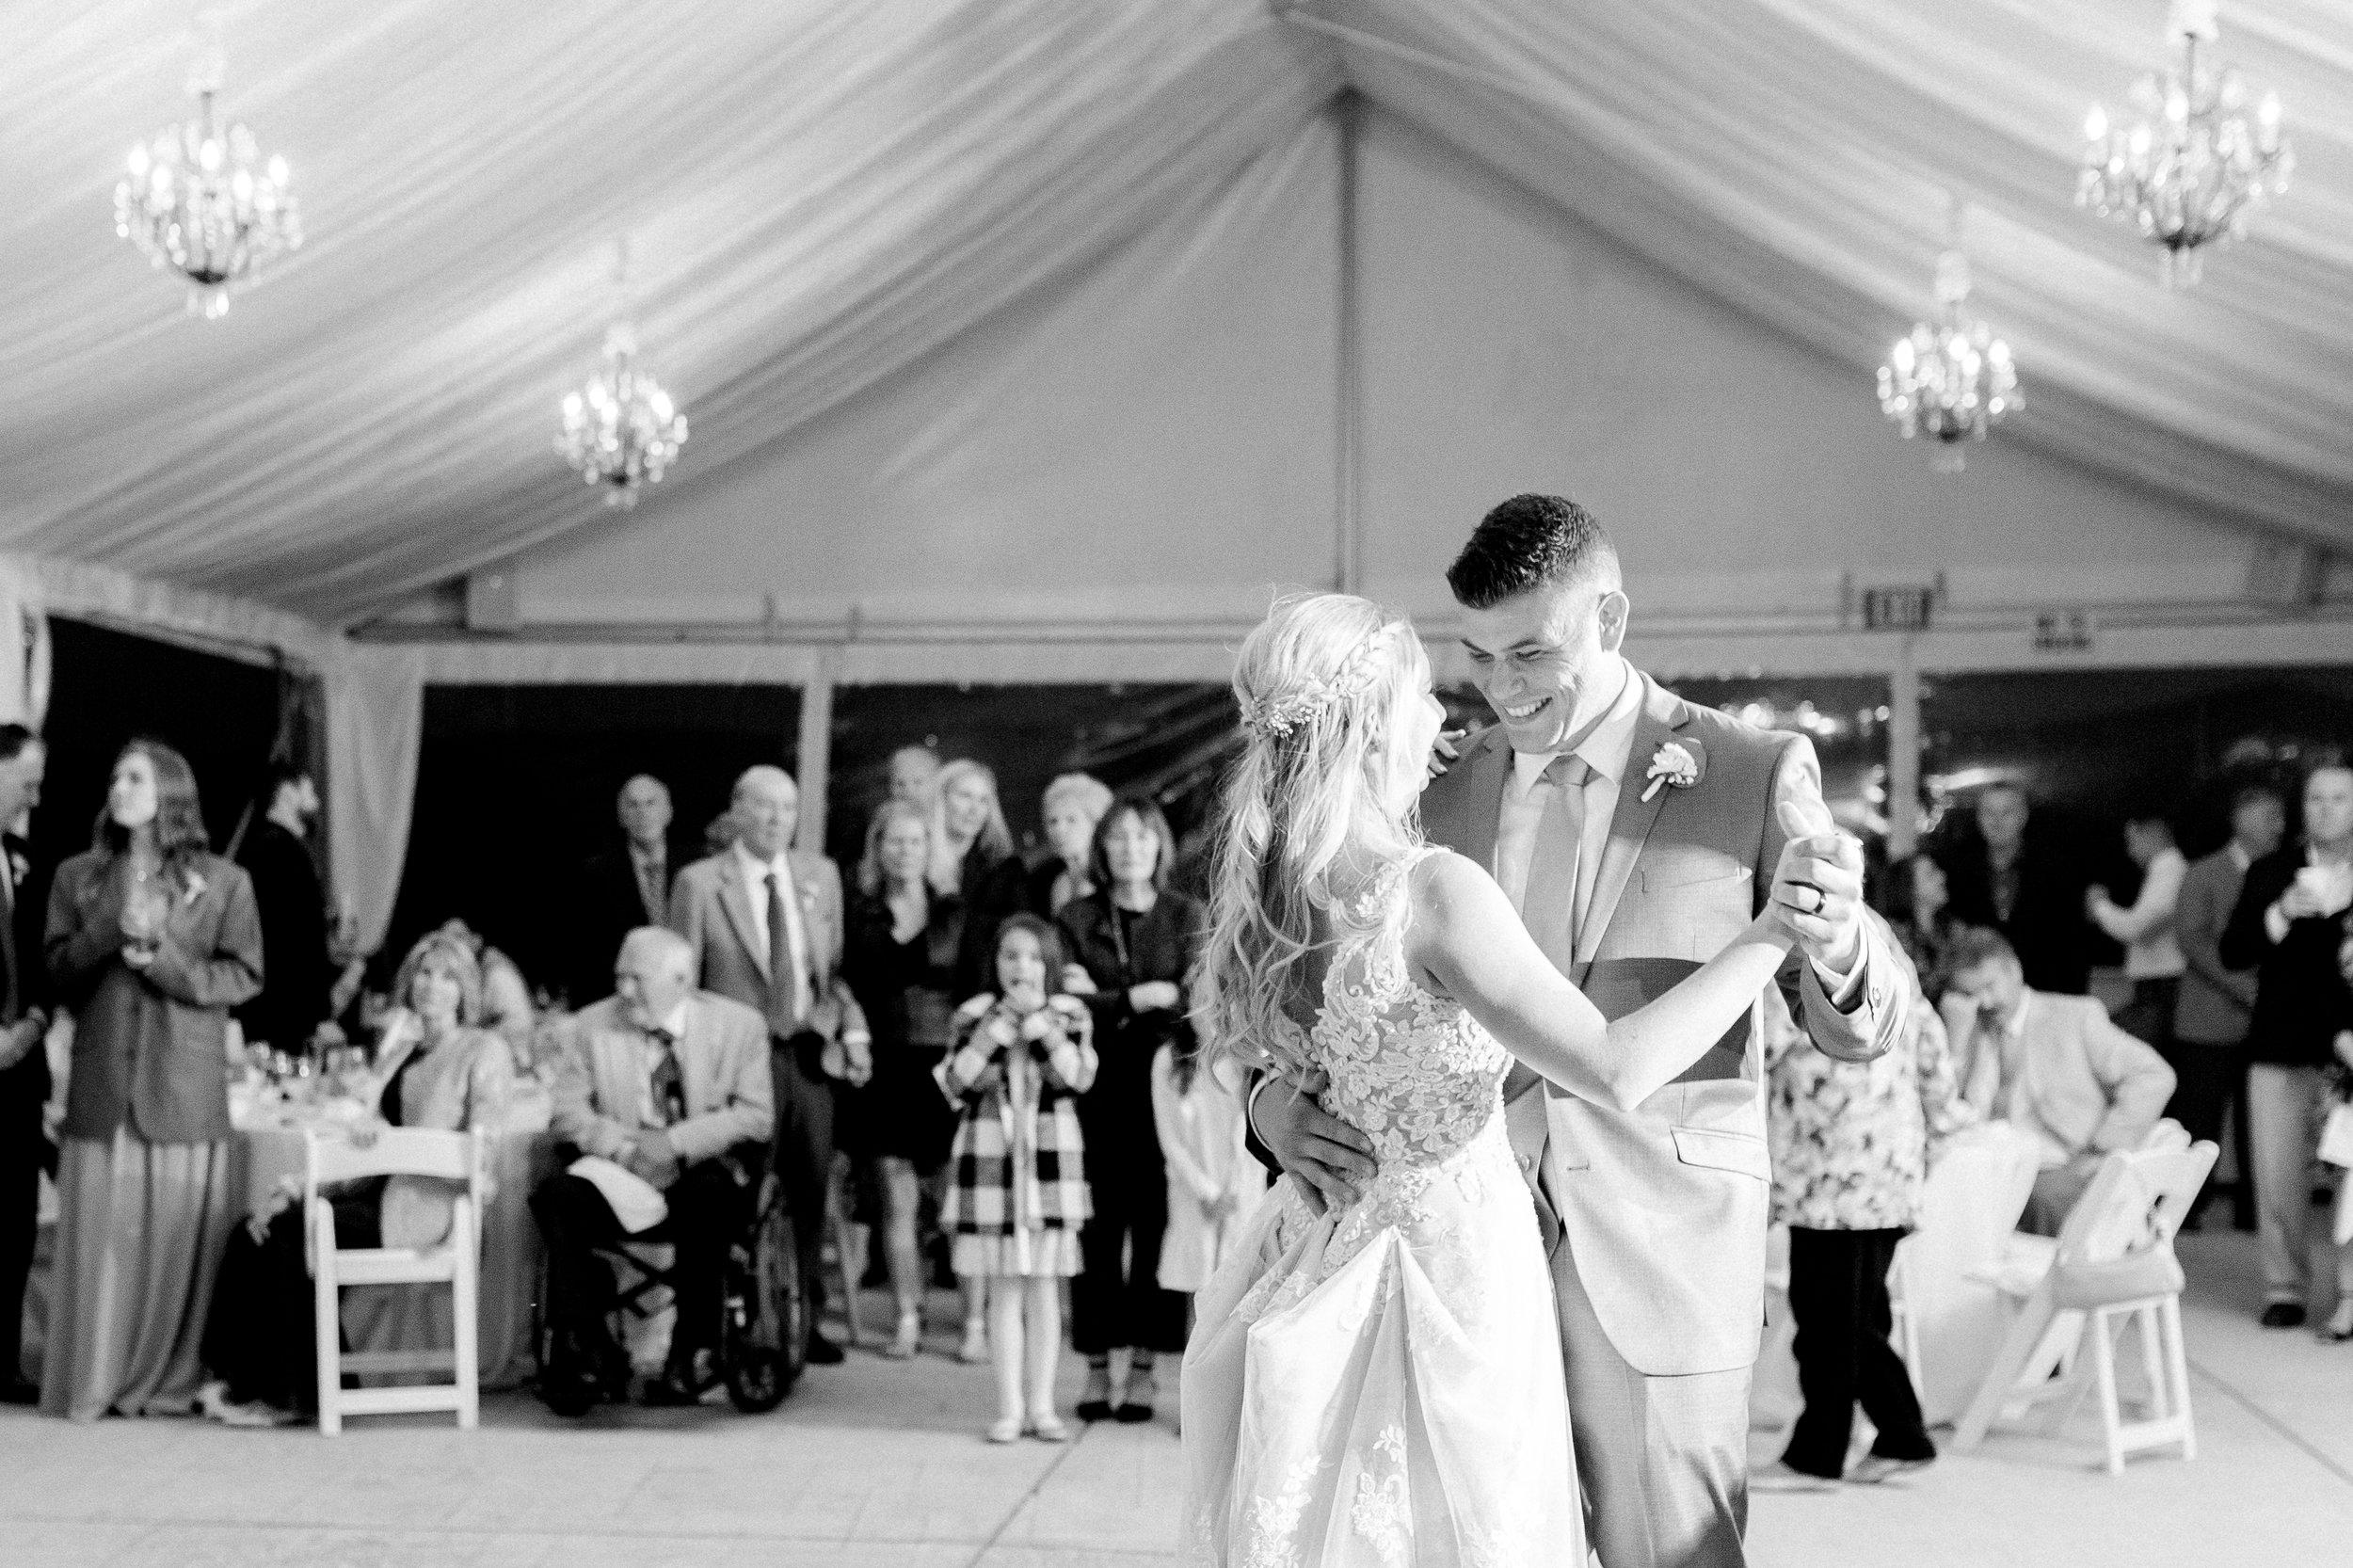 Eagle-Vines-Golf-Course-wedding-photographer (194 of 206).jpg